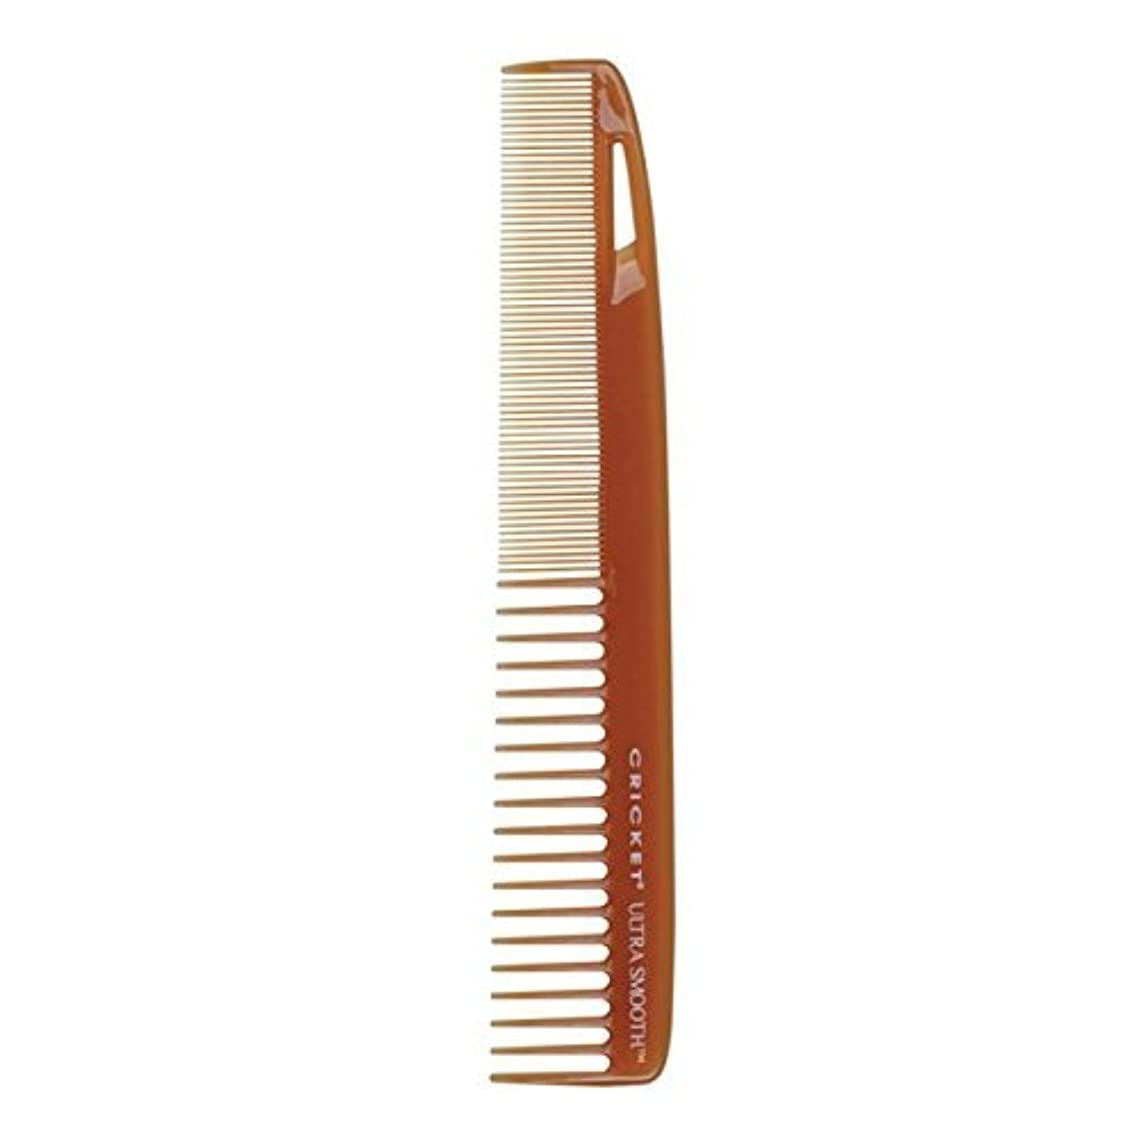 Cricket Ultra Smooth All Purpose Comb 20 [並行輸入品]